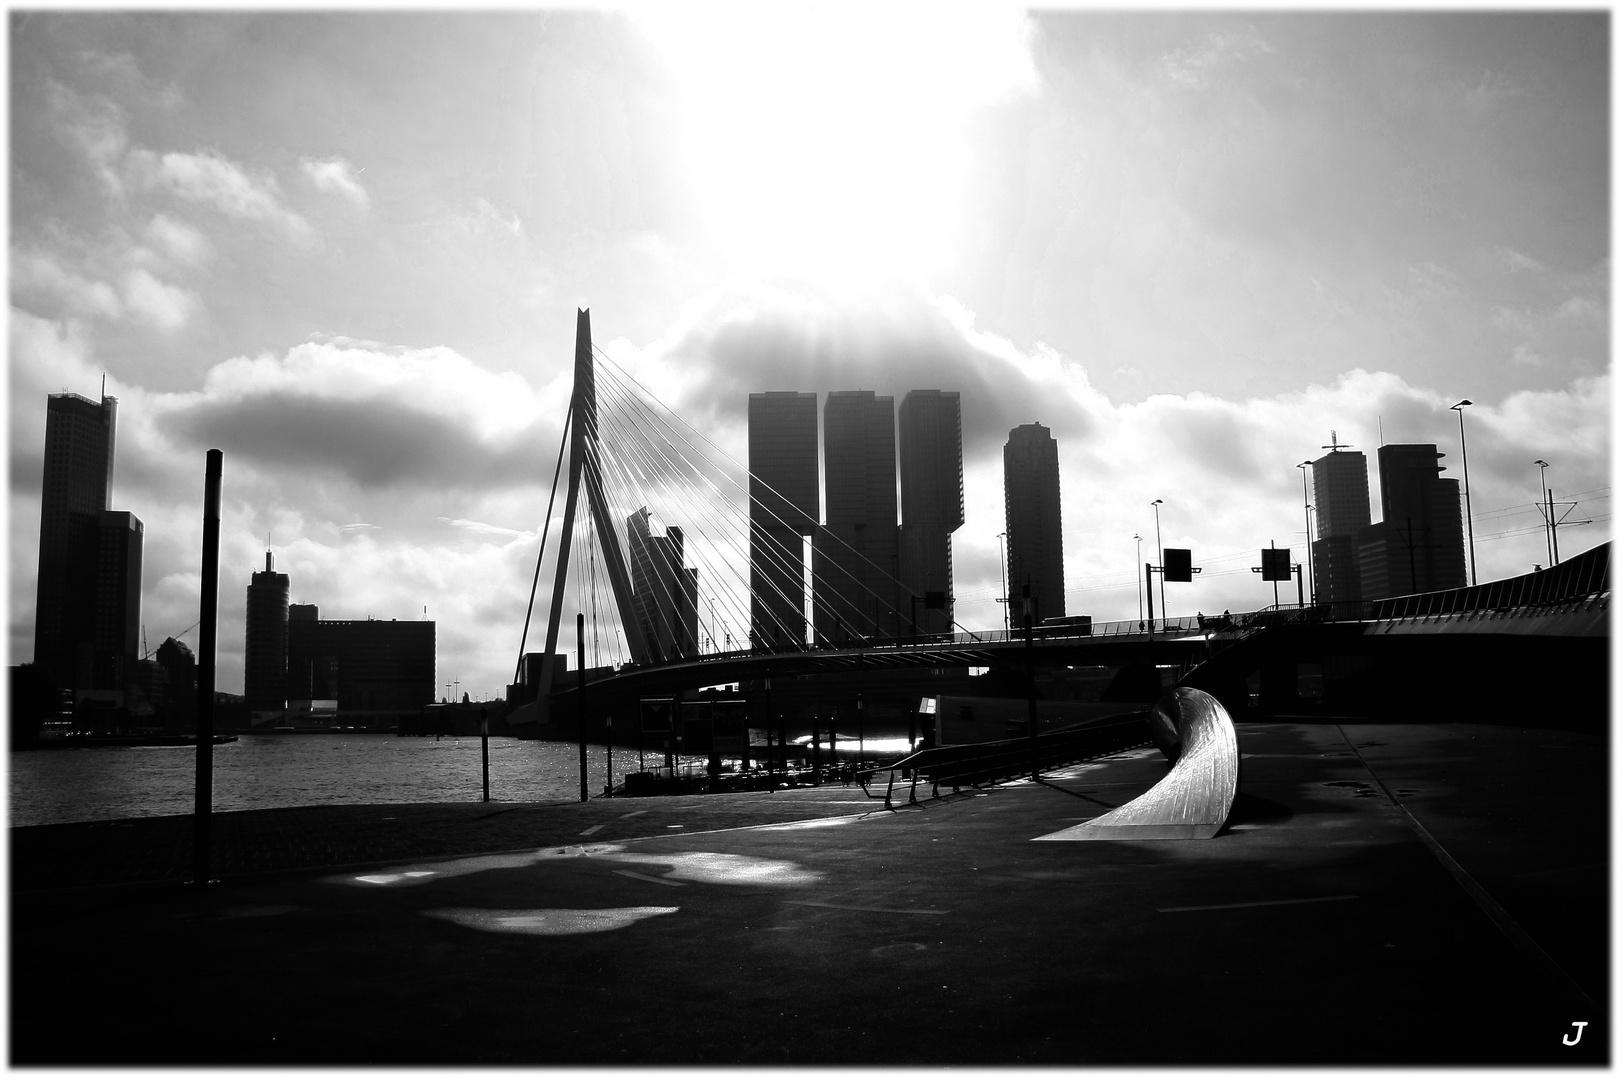 City-Impressionen